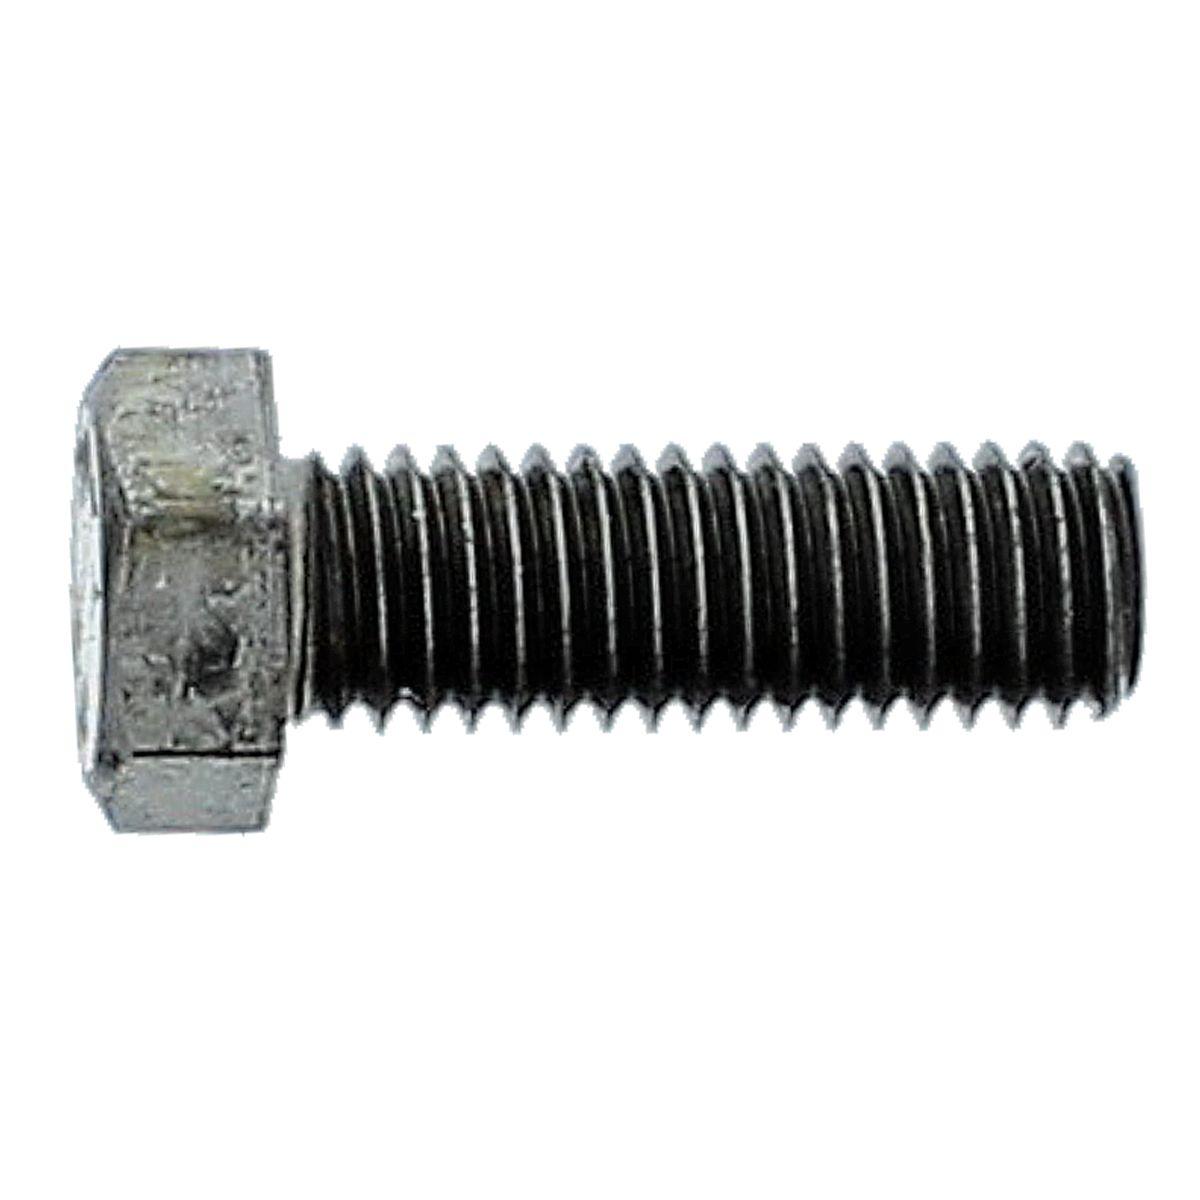 "1""-8 x 2-1/2"" Hex Bolts — ASTM A307 Grade A, Coarse Thread, Plain, 1/PKG"